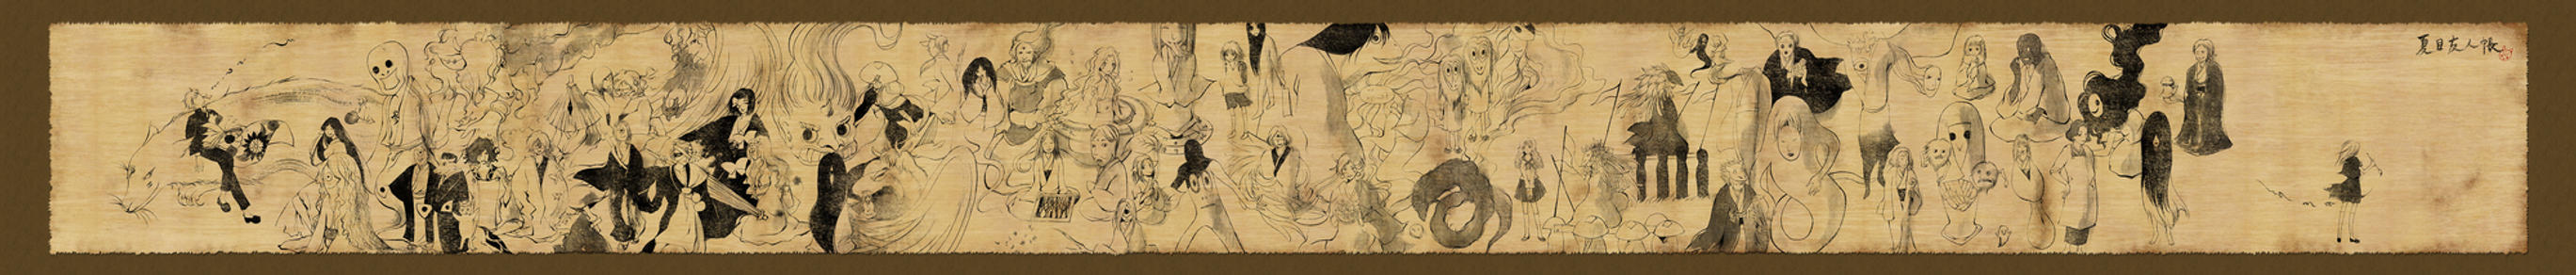 Natsume Yuujinchou: Natsume monster scroll by muttiy